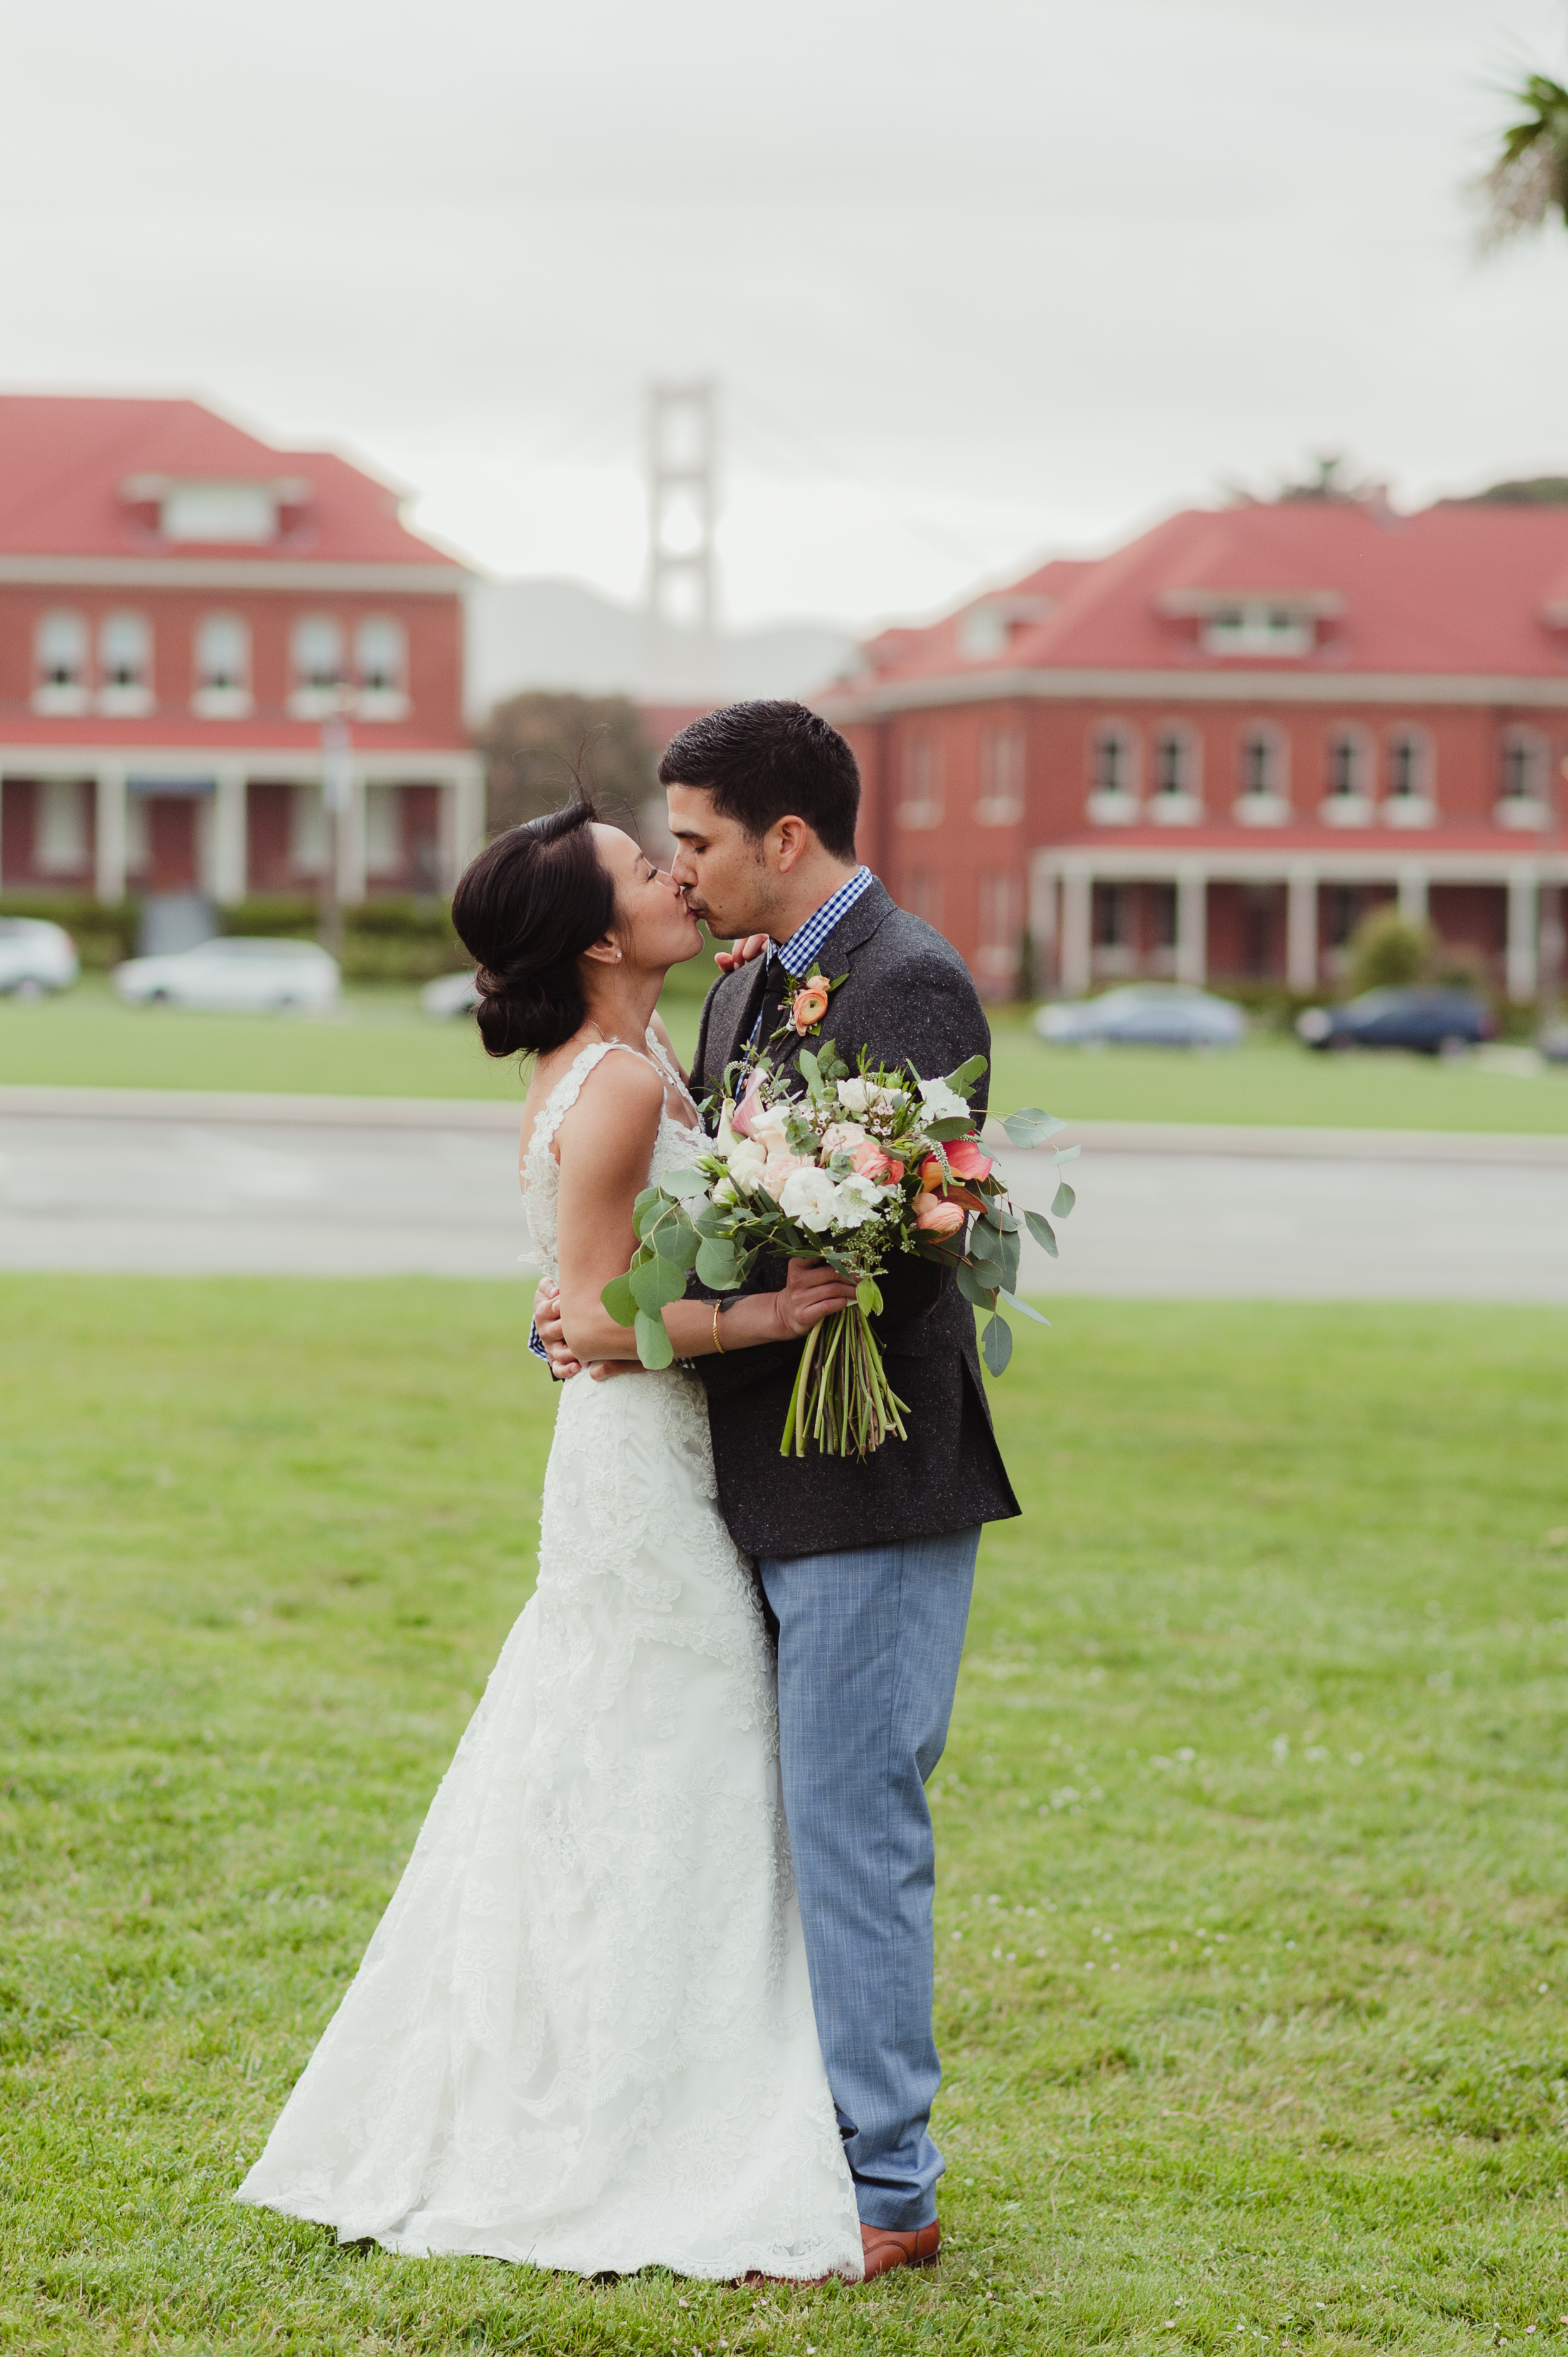 24-san-francisco-film-centre-wedding-vivianchen-279.jpg